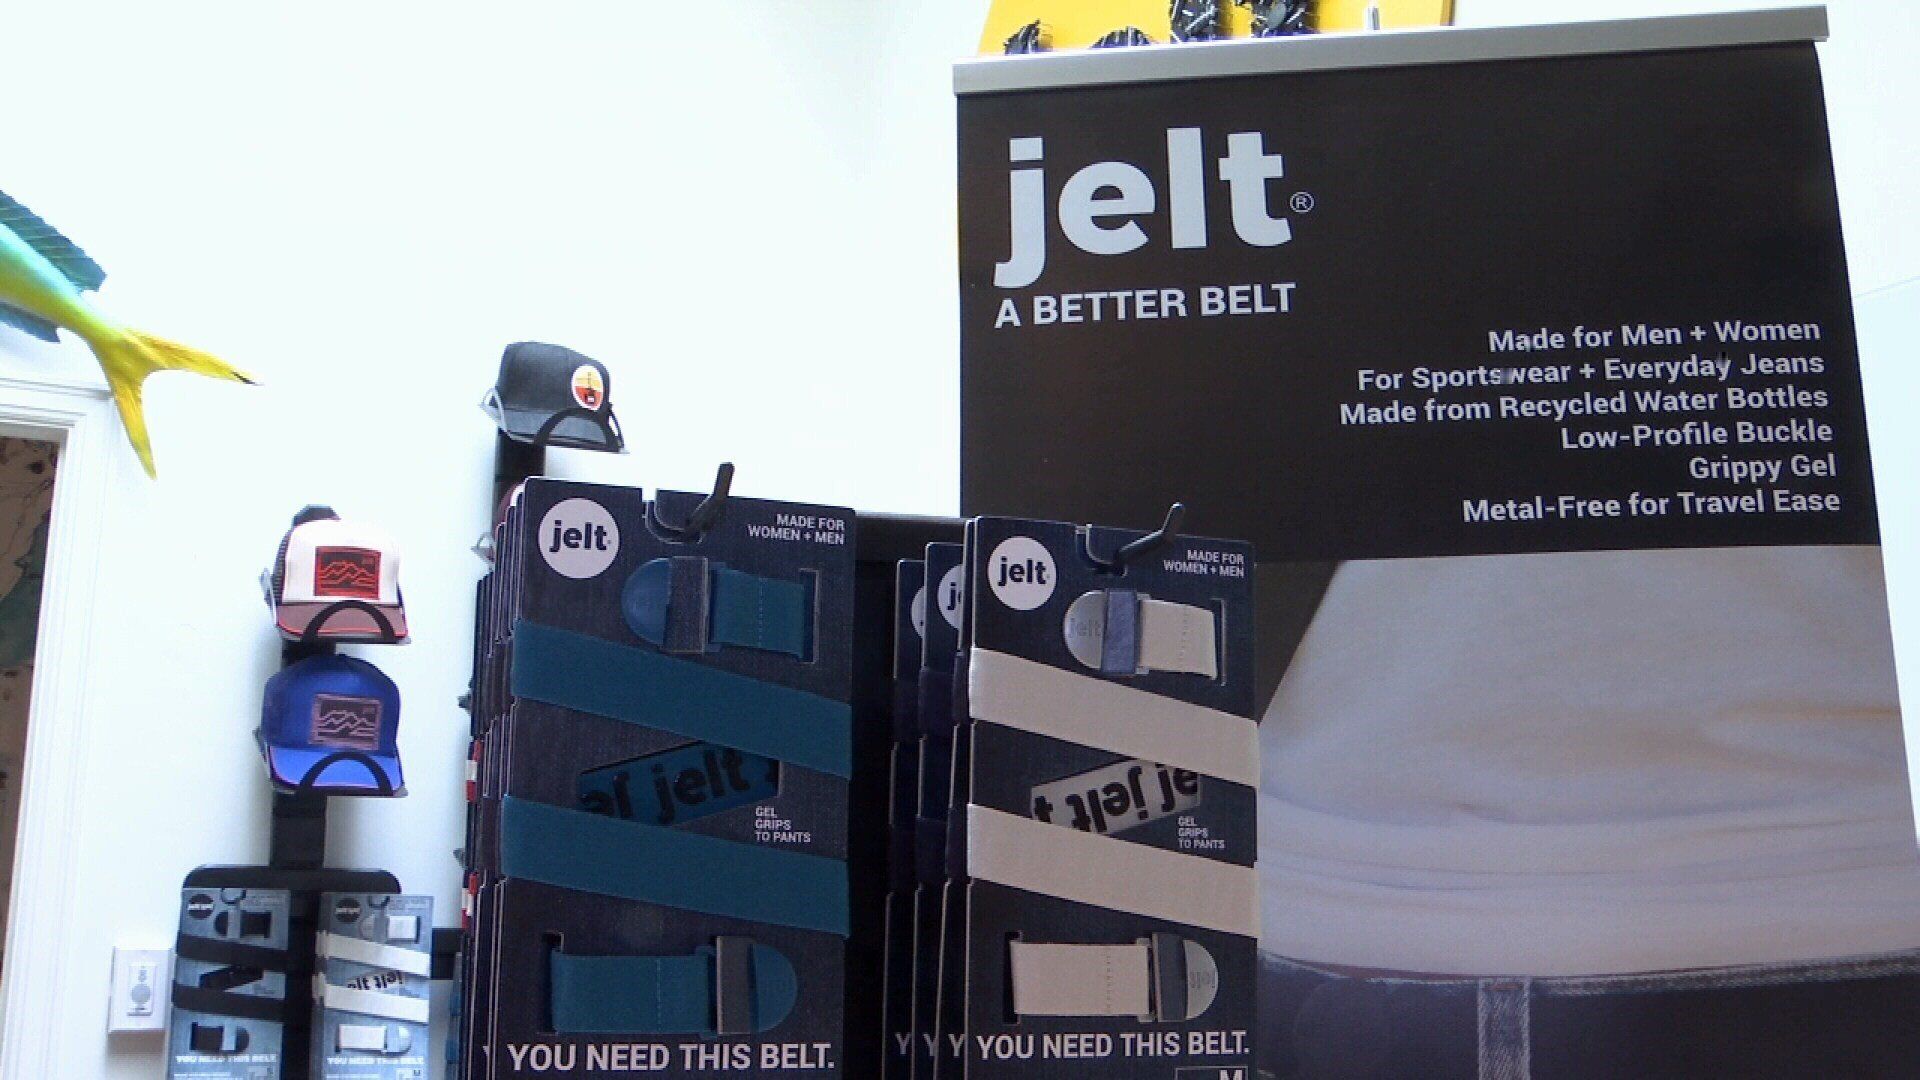 Jelt Belt's are manufactured at the Montana Women's Prison (MTN News/Paul Humphrey Photo)